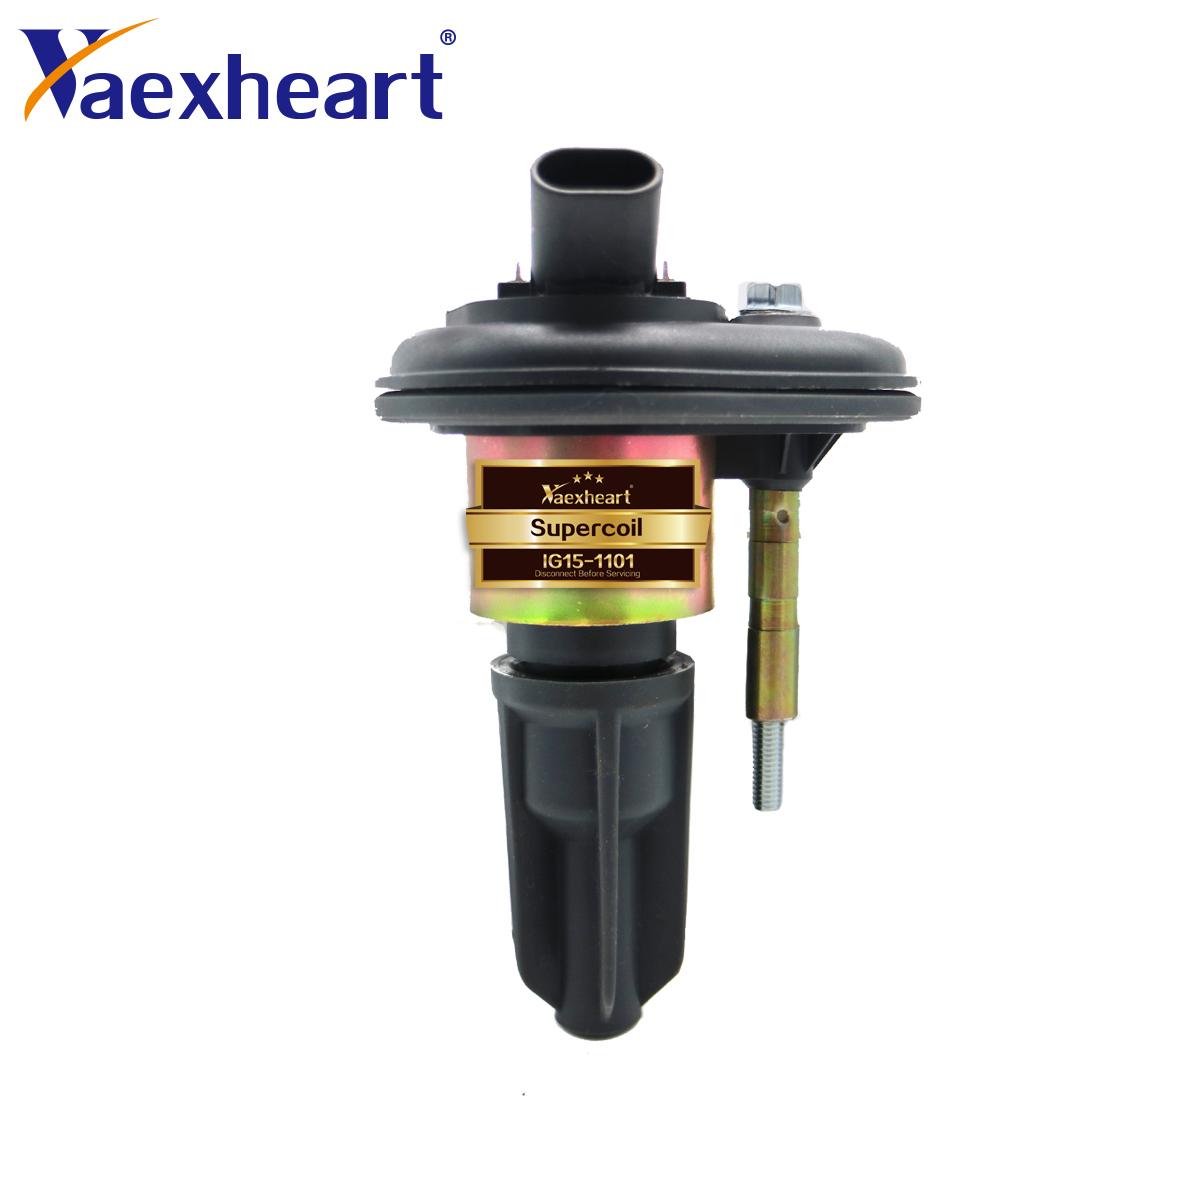 Ignition Coil Trailblazer: 6PCS Ignition Coil Cassette For 02-05 Chevy Trailblazer